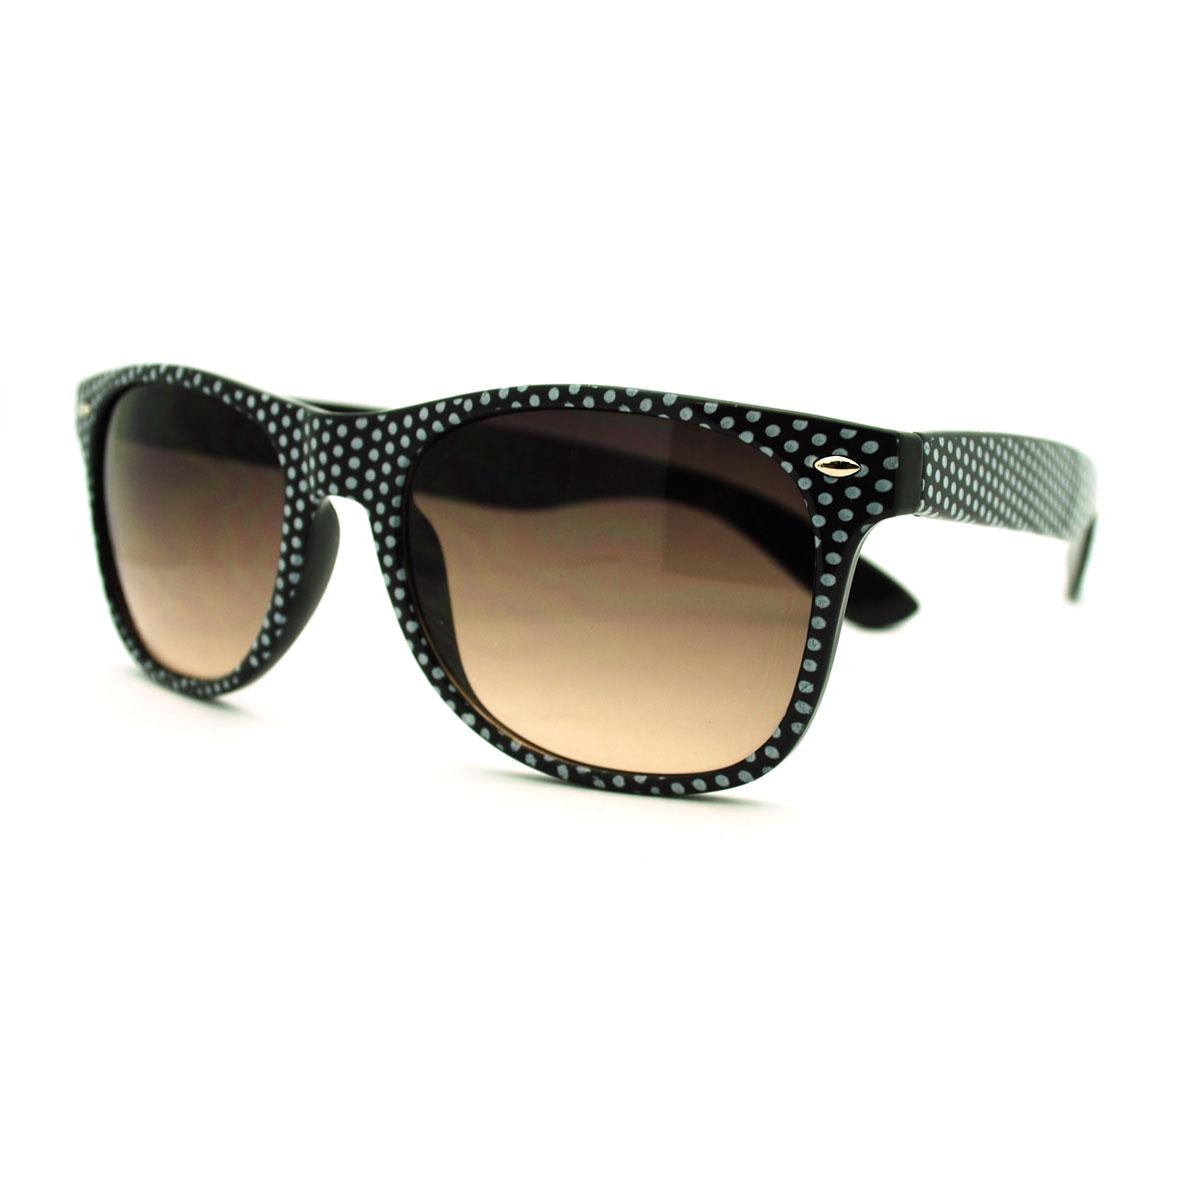 classic wayfarer 50mm polarized sunglasses  patterned wayfarer